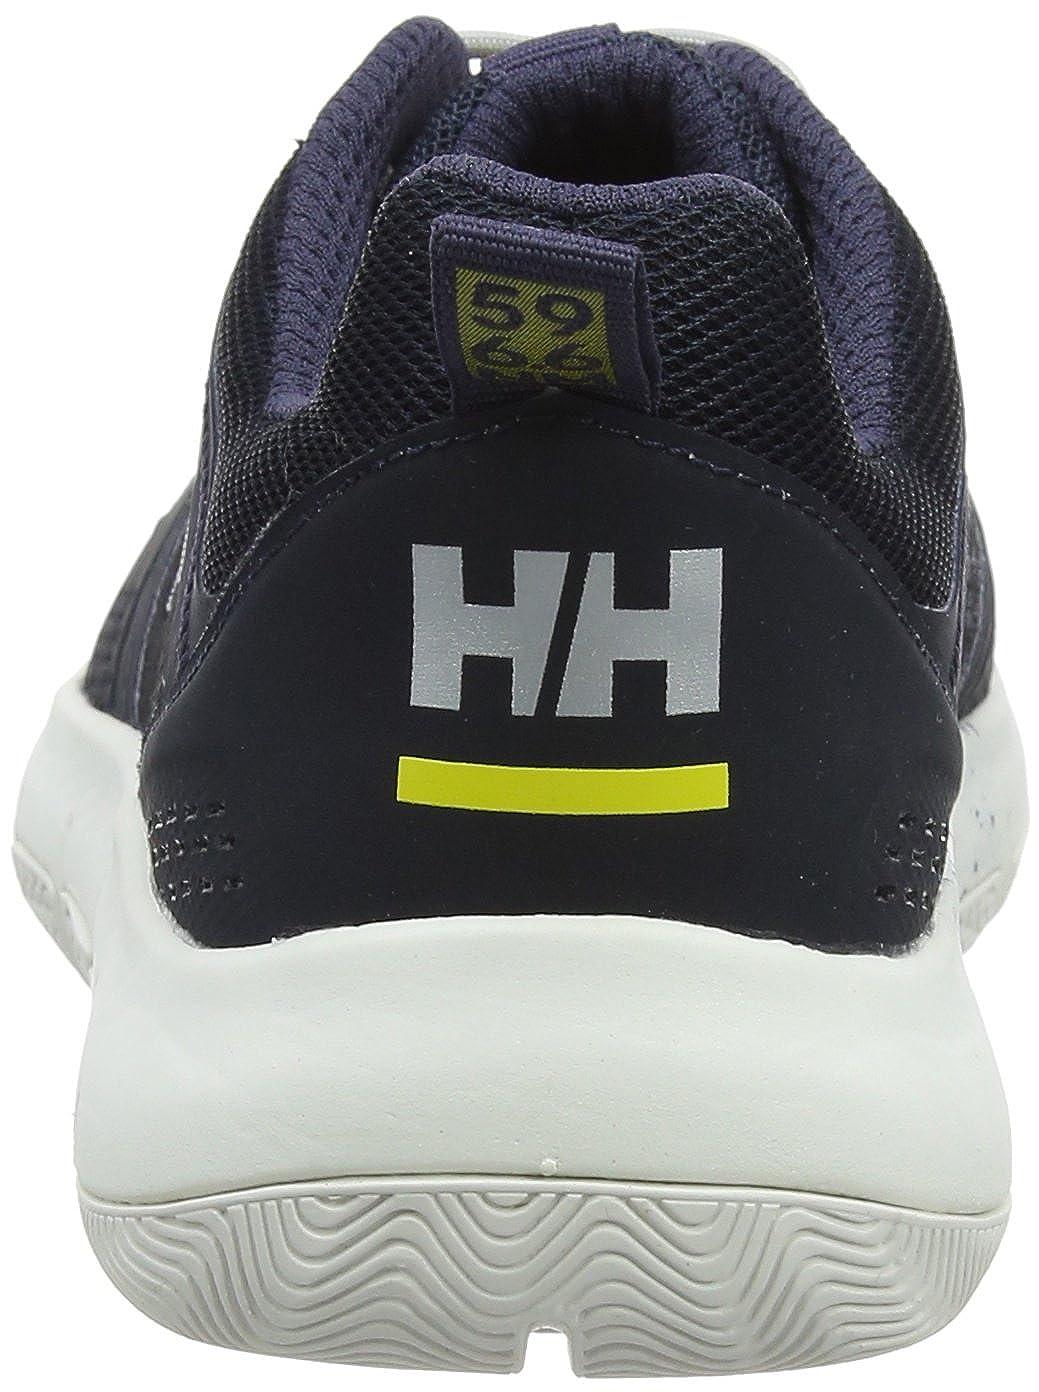 Helly Hansen Damen W Skagen F 1 Offshore Fitnessschuhe